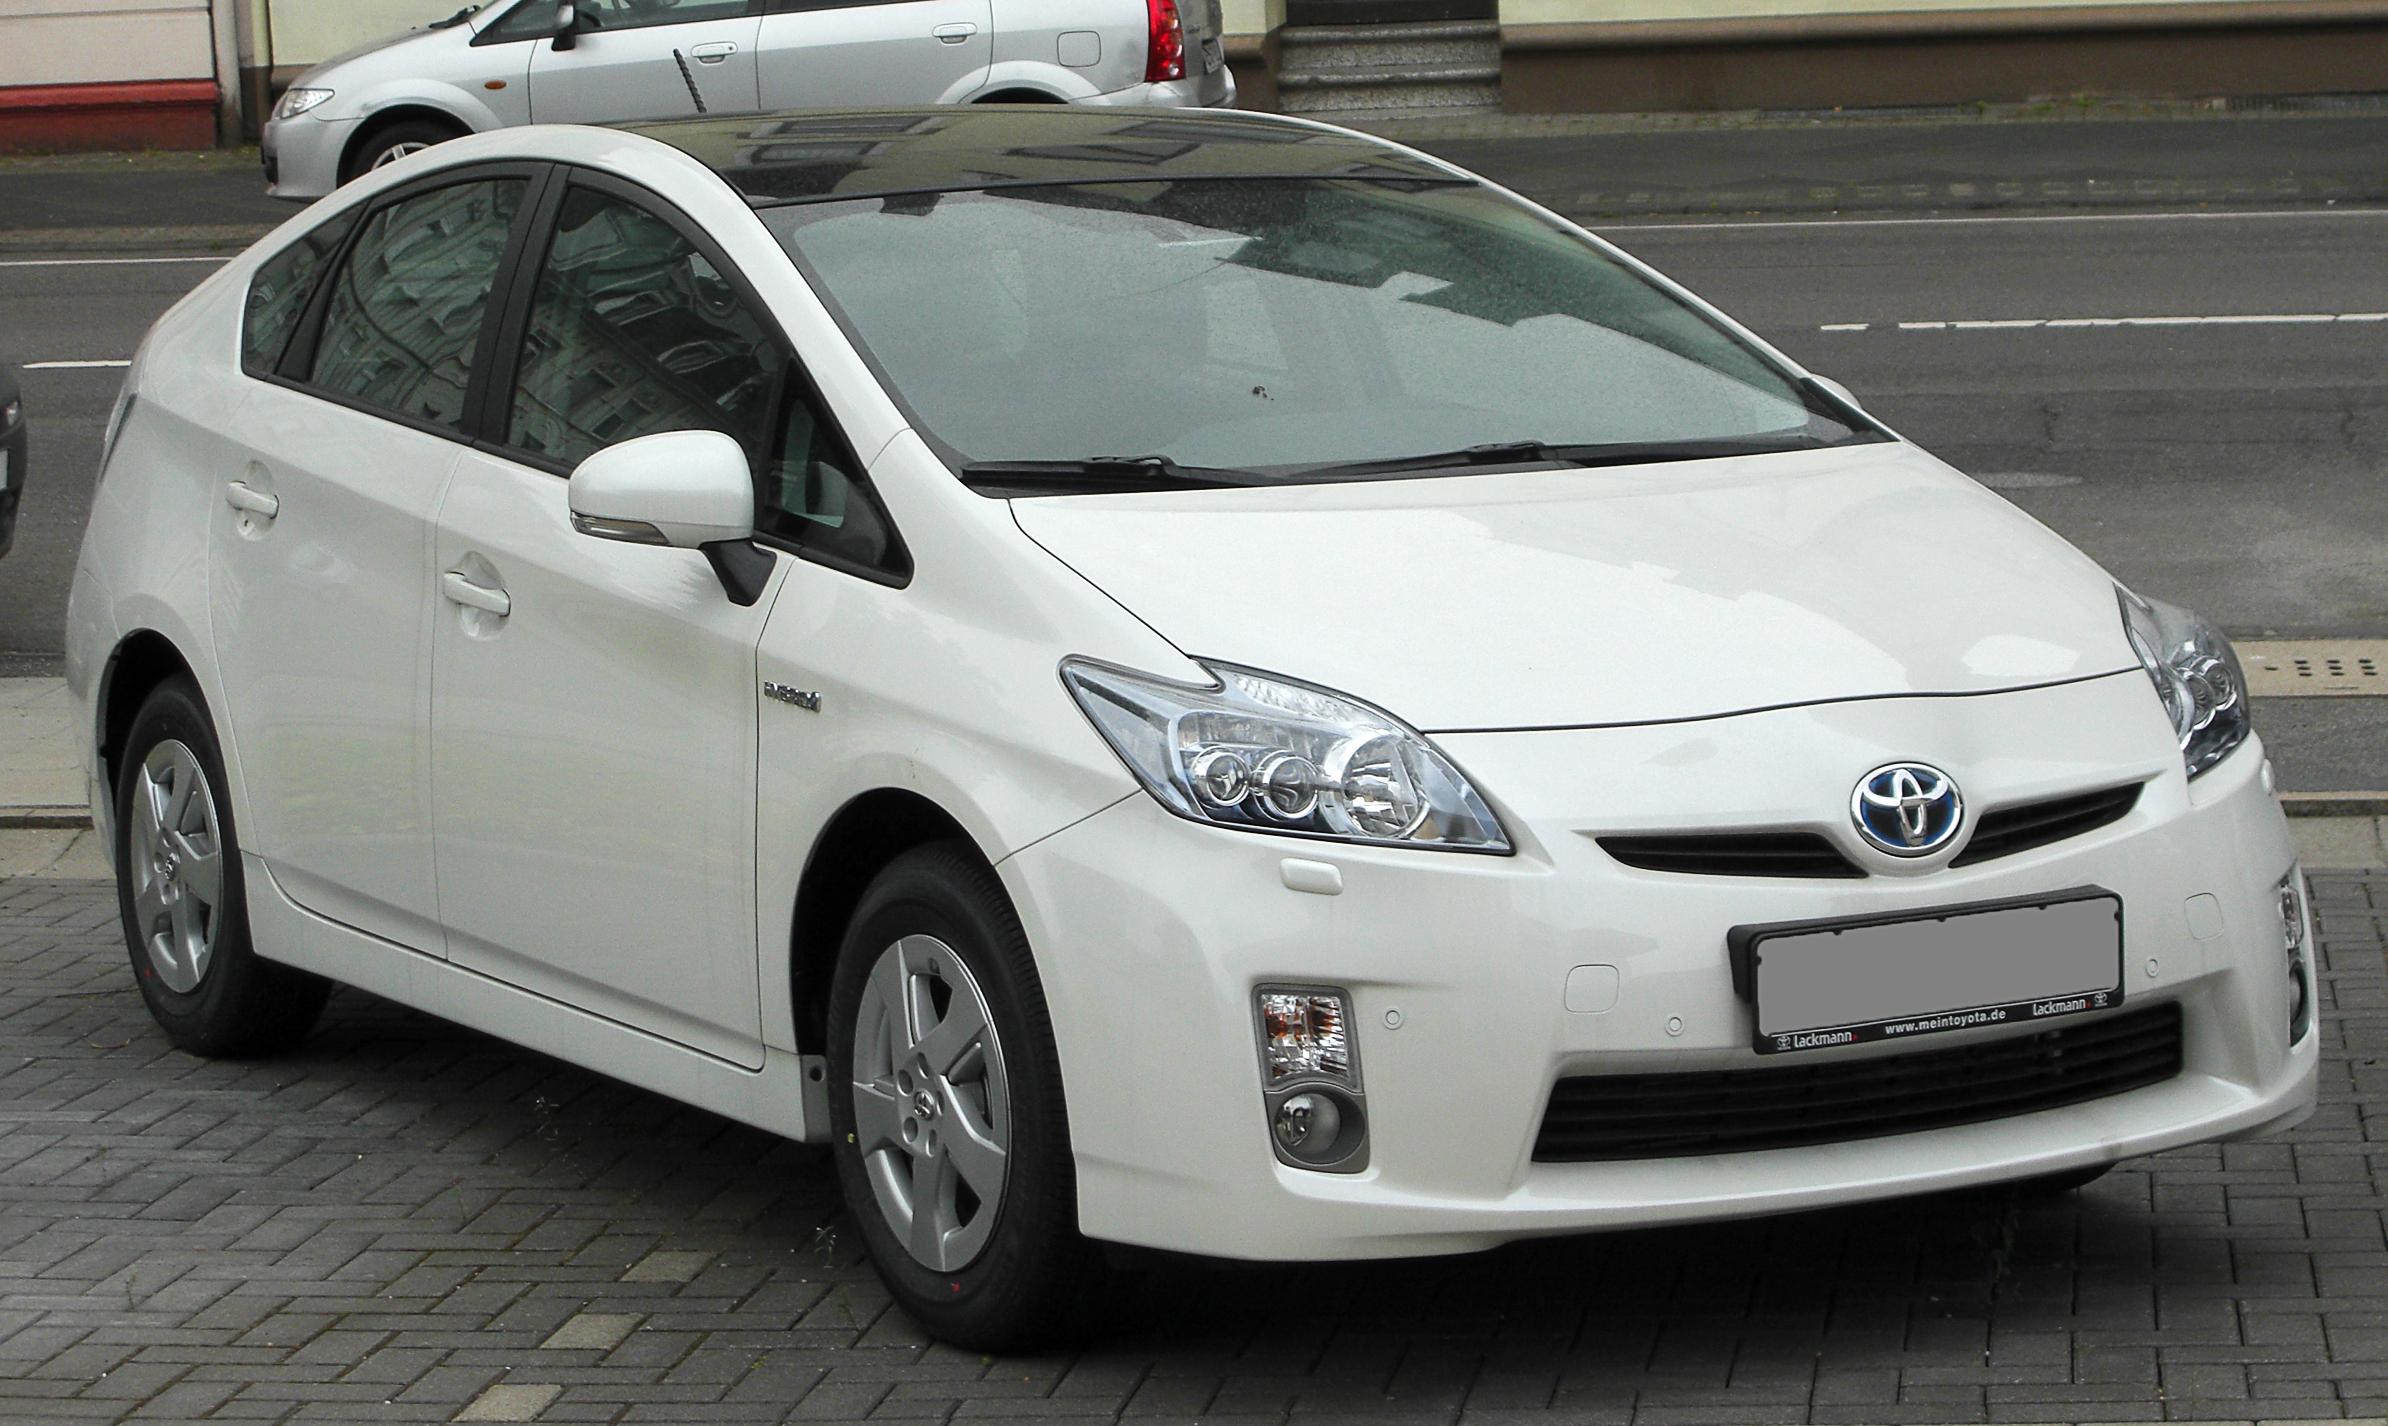 Car Parking Sensor Price In Pakistan